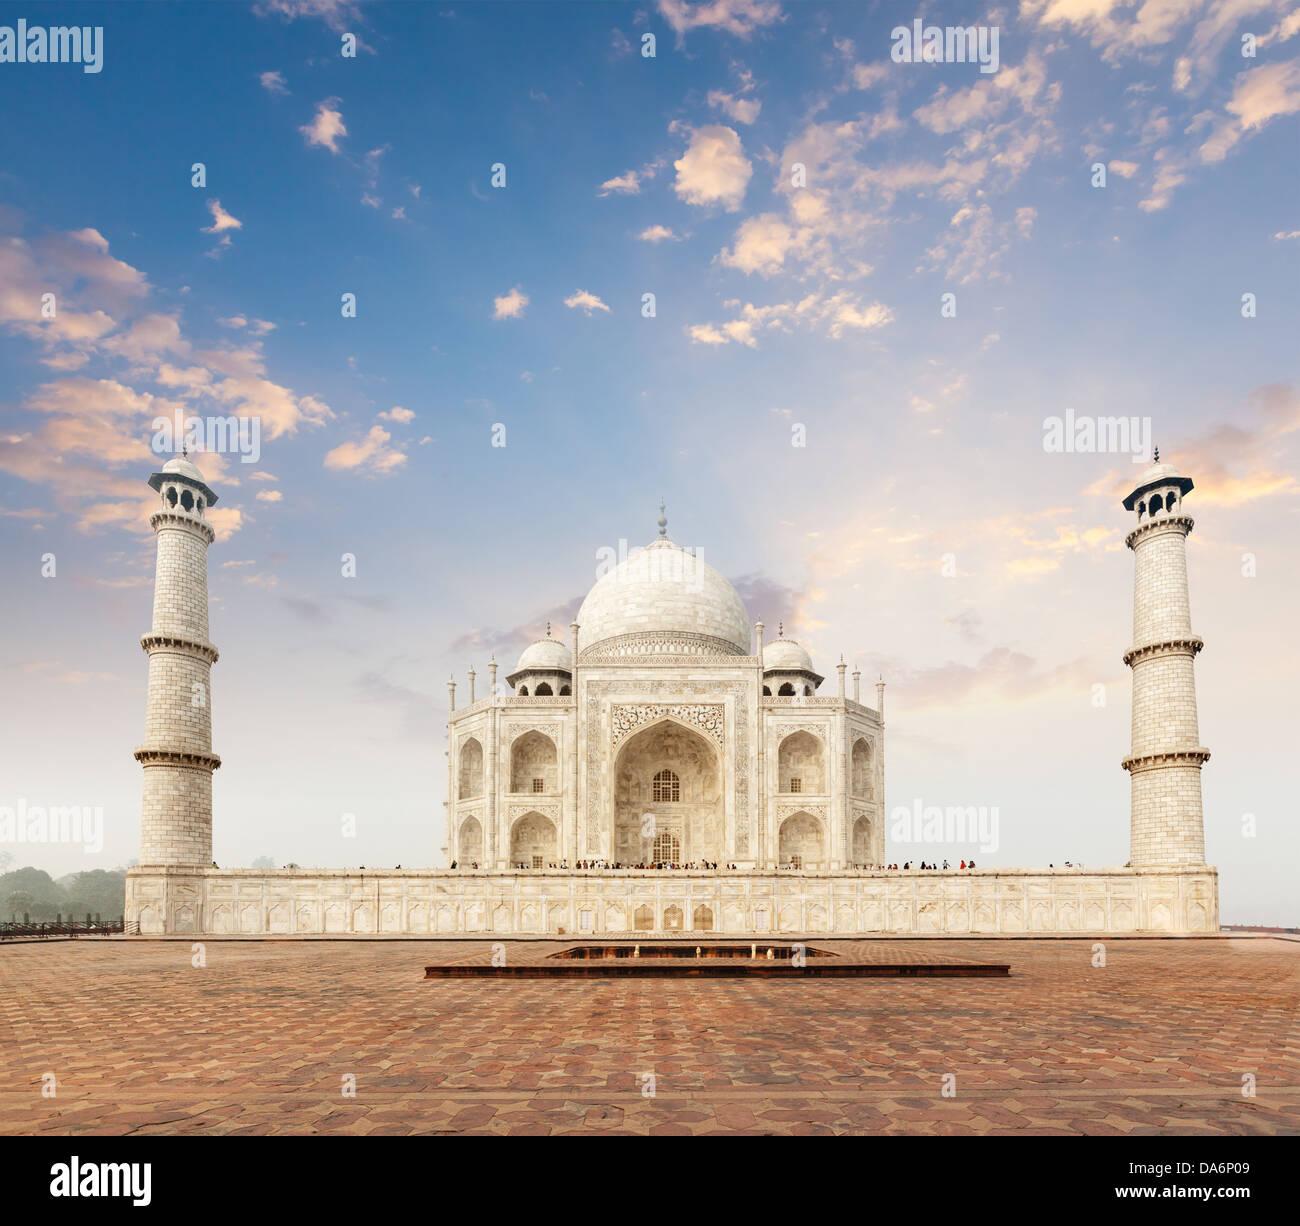 Taj Mahal. Indian Symbol - India travel background. Agra, India Stock Photo